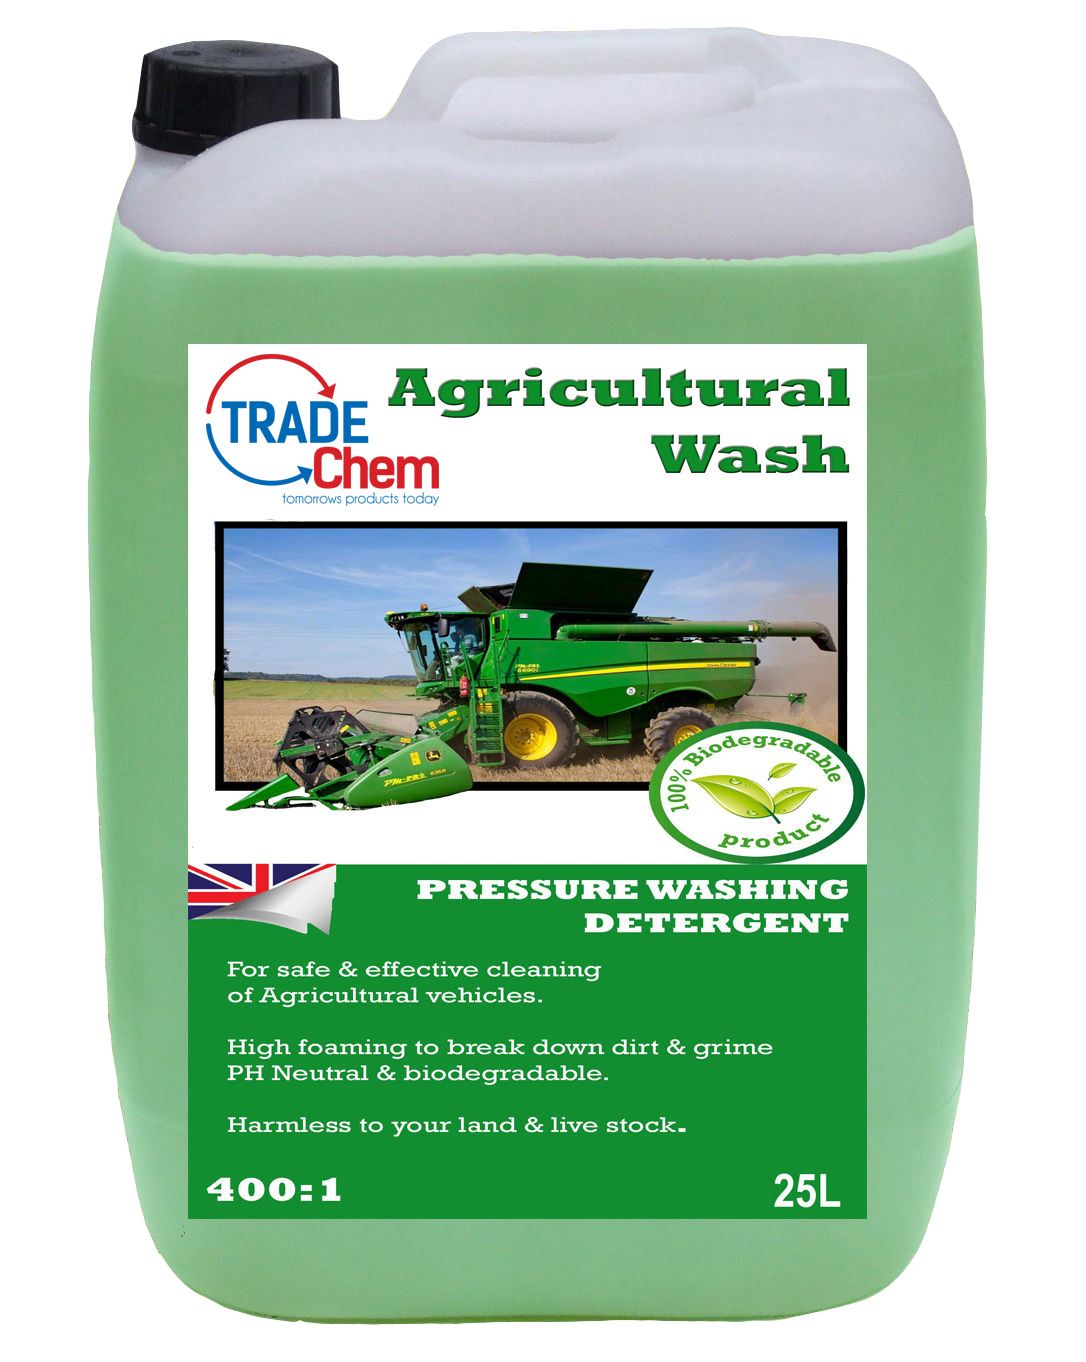 Agricultural Wash 400:1 Tractor Clean 25L Litre HGV TFR